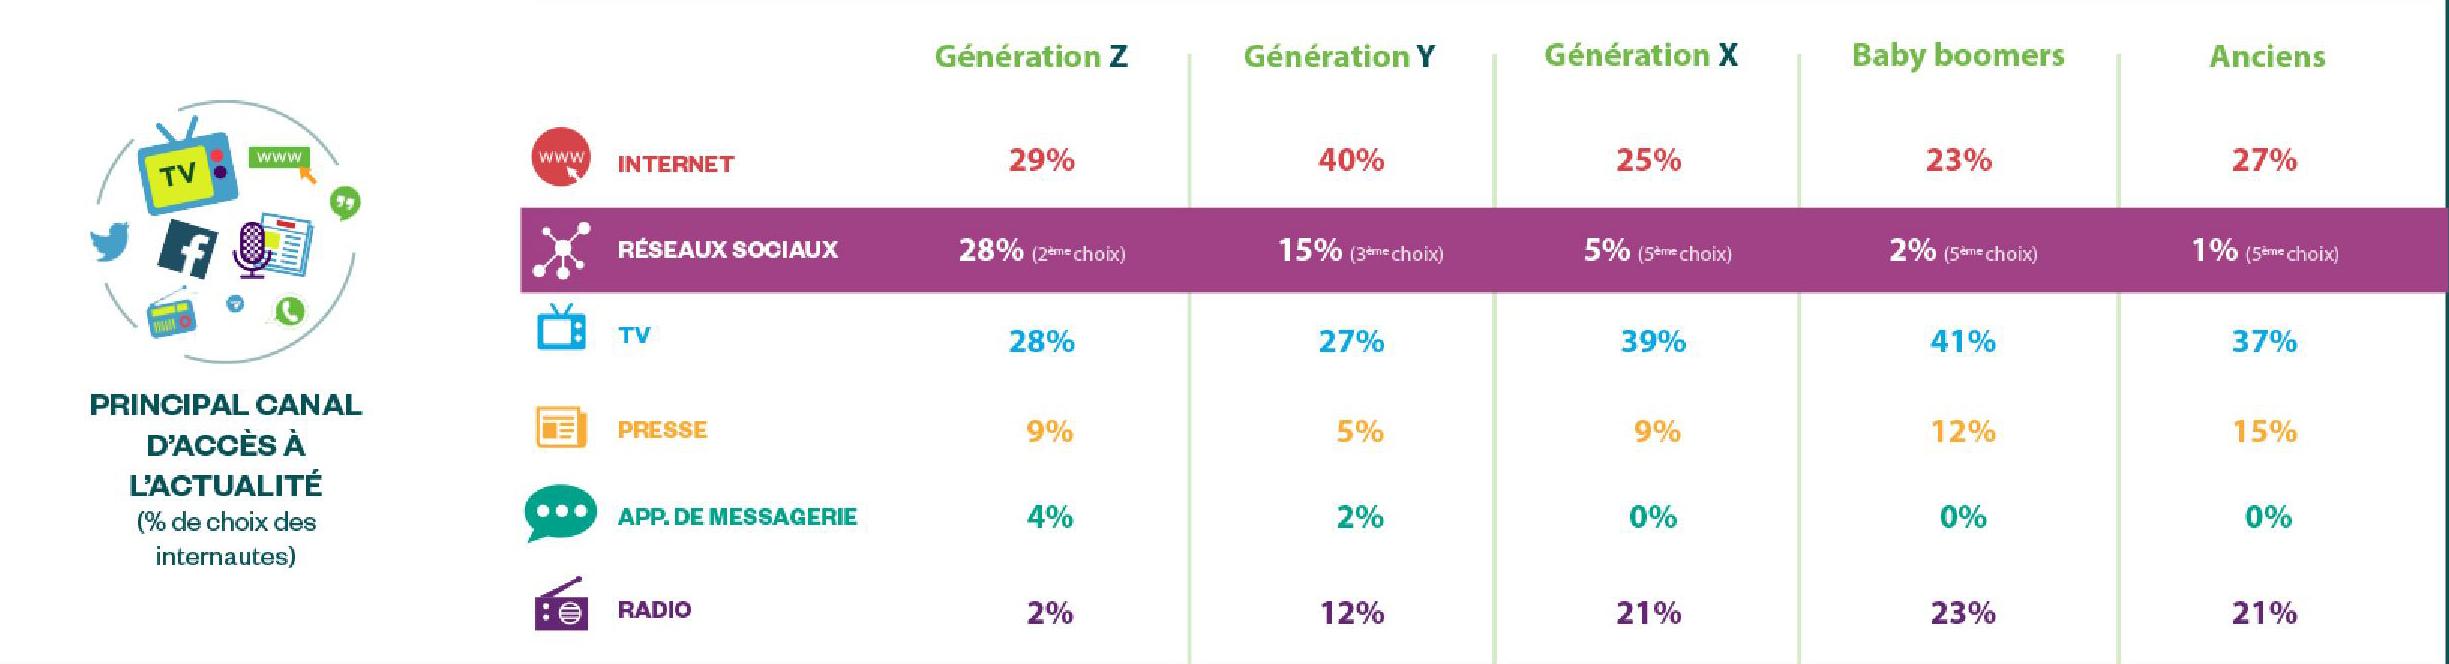 social-life-2017-infographie-harris-interactive-part-5